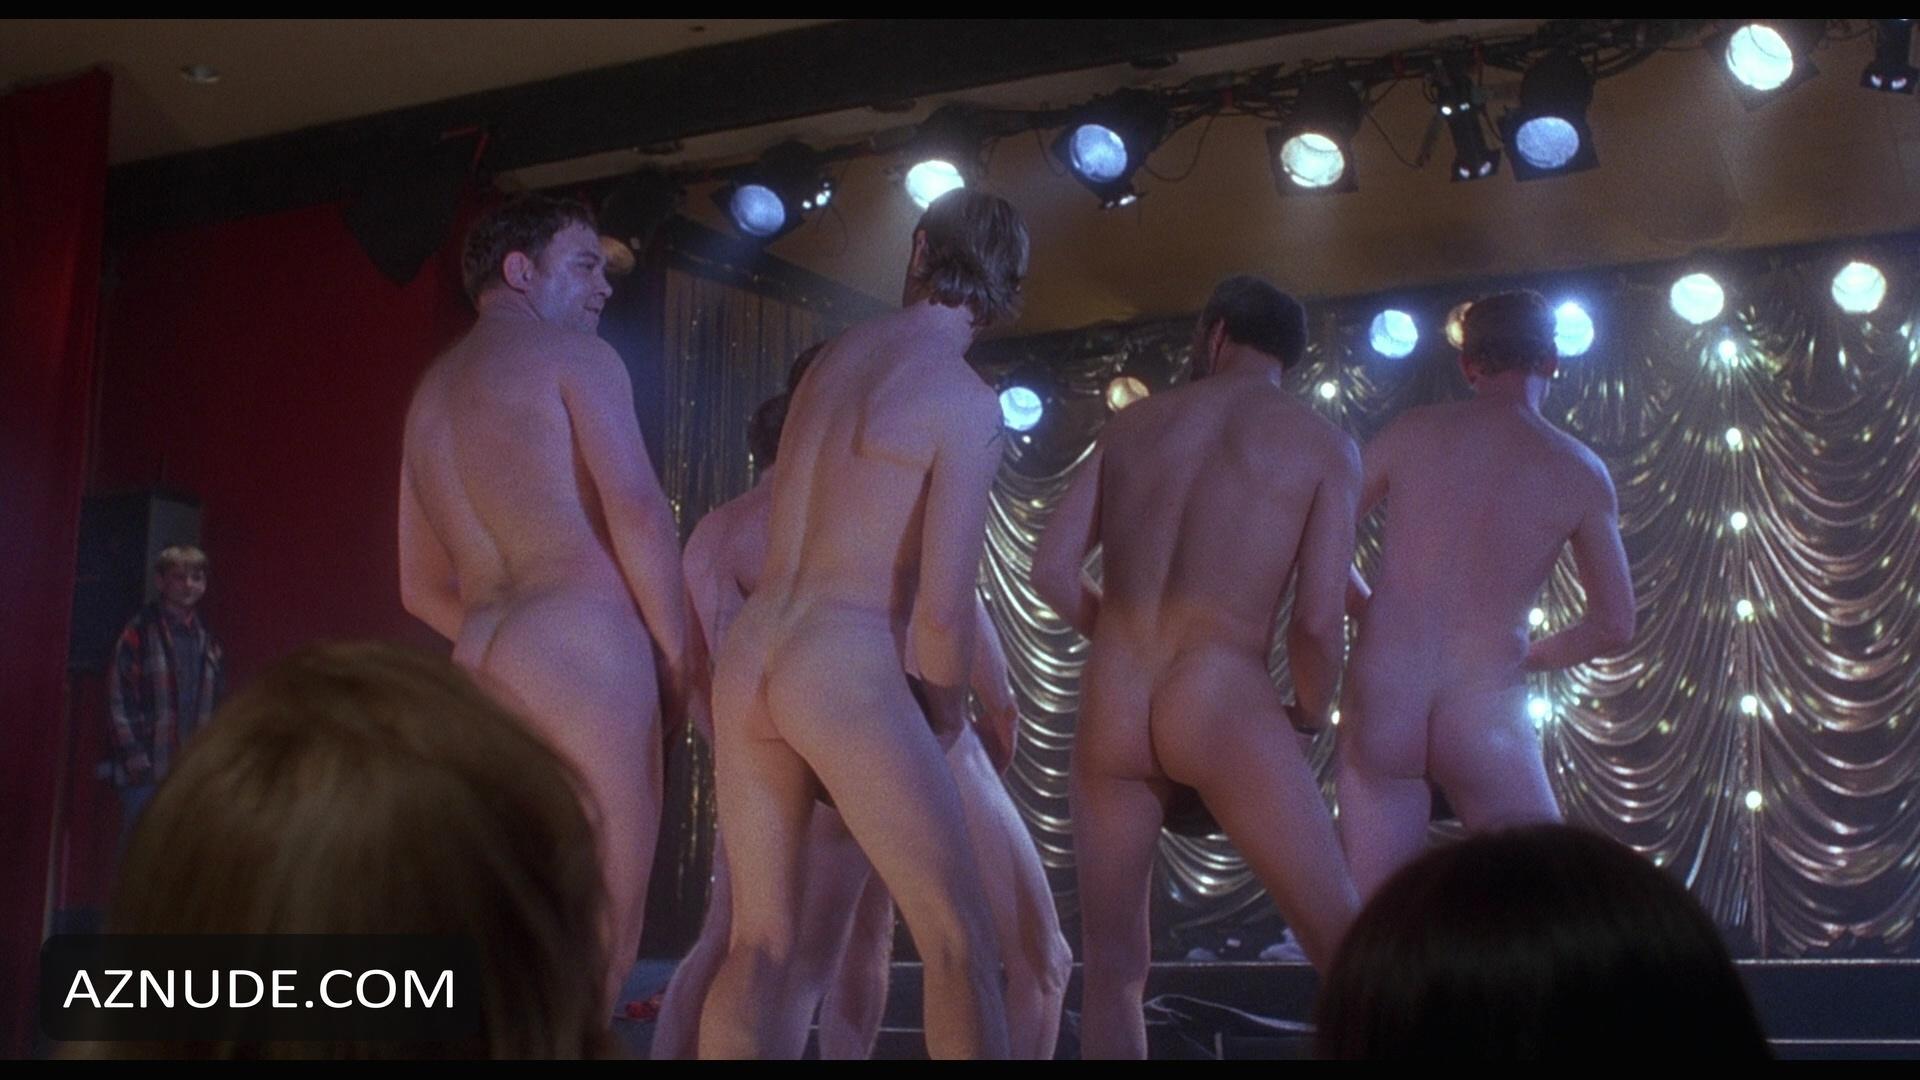 Nude Full Photo